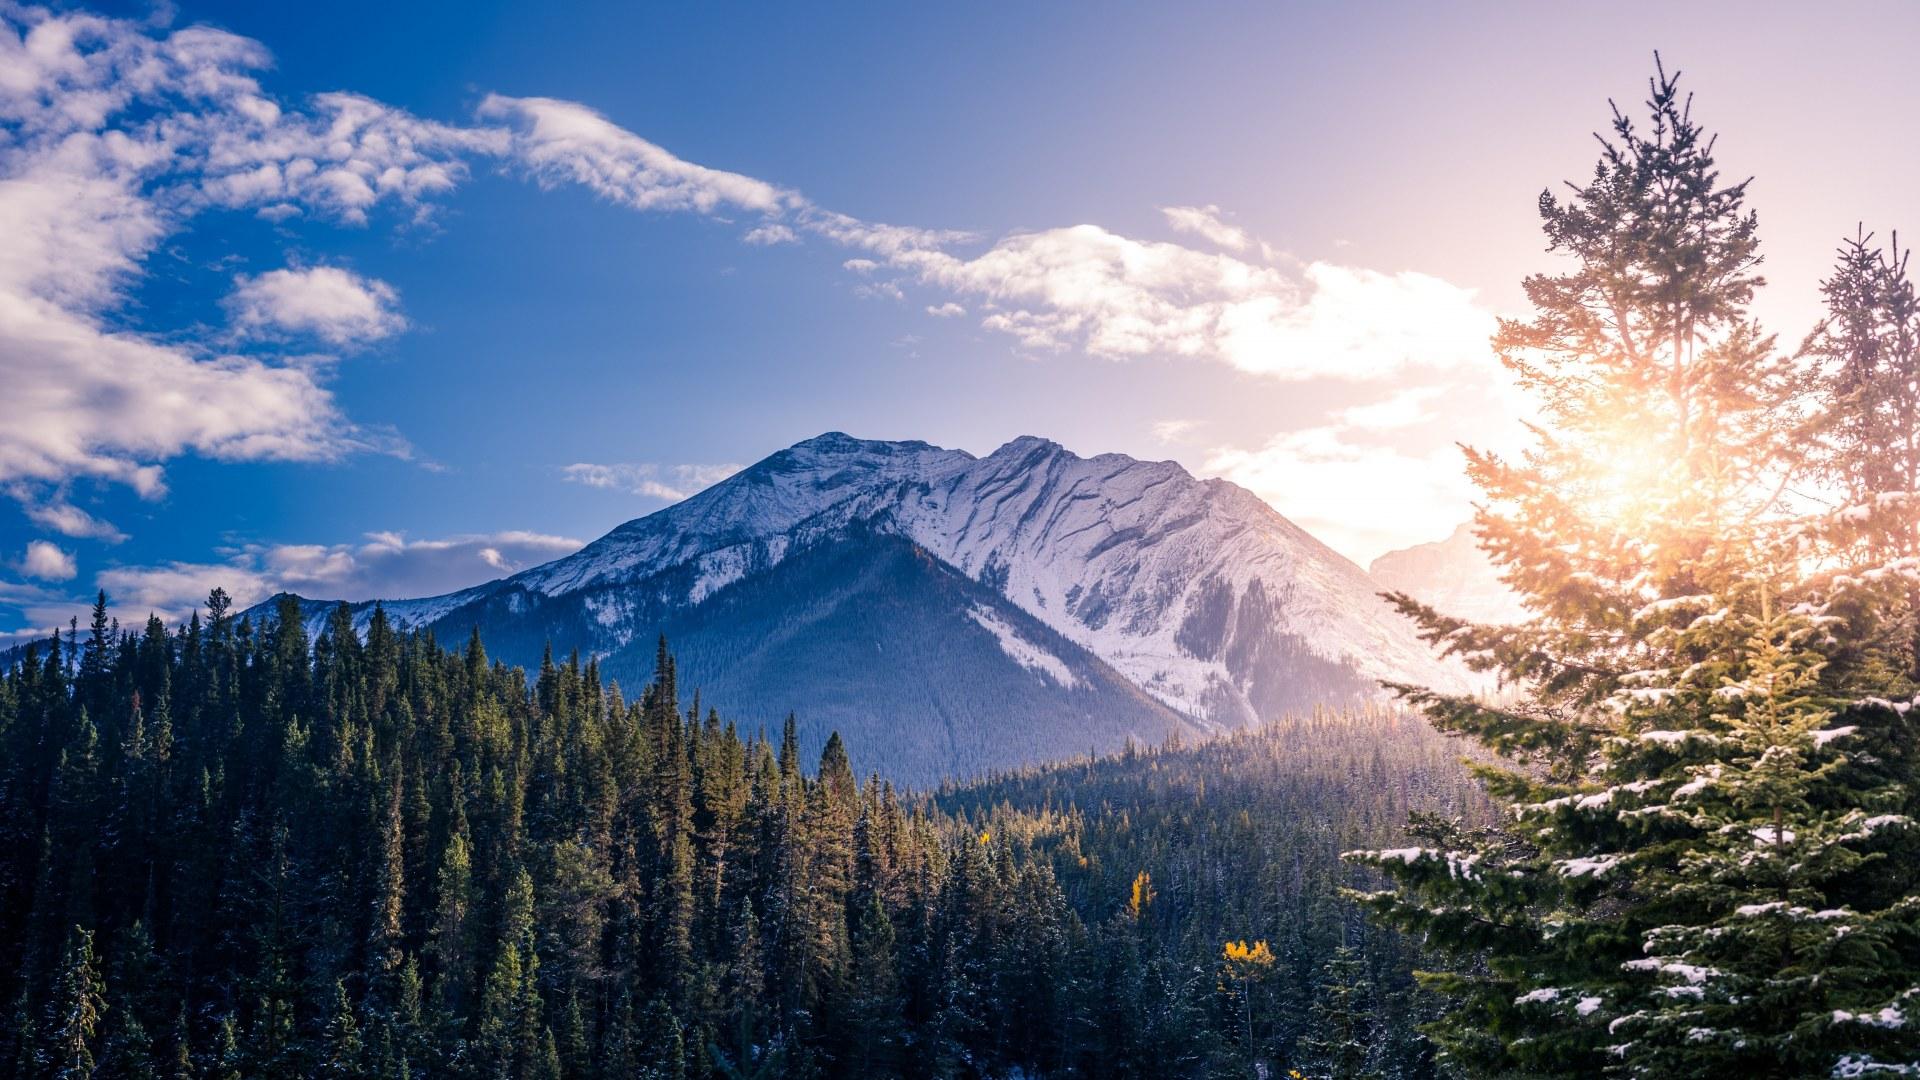 Mountain Mountain Range Nature Outdoors Peak Resized By Ze Robot